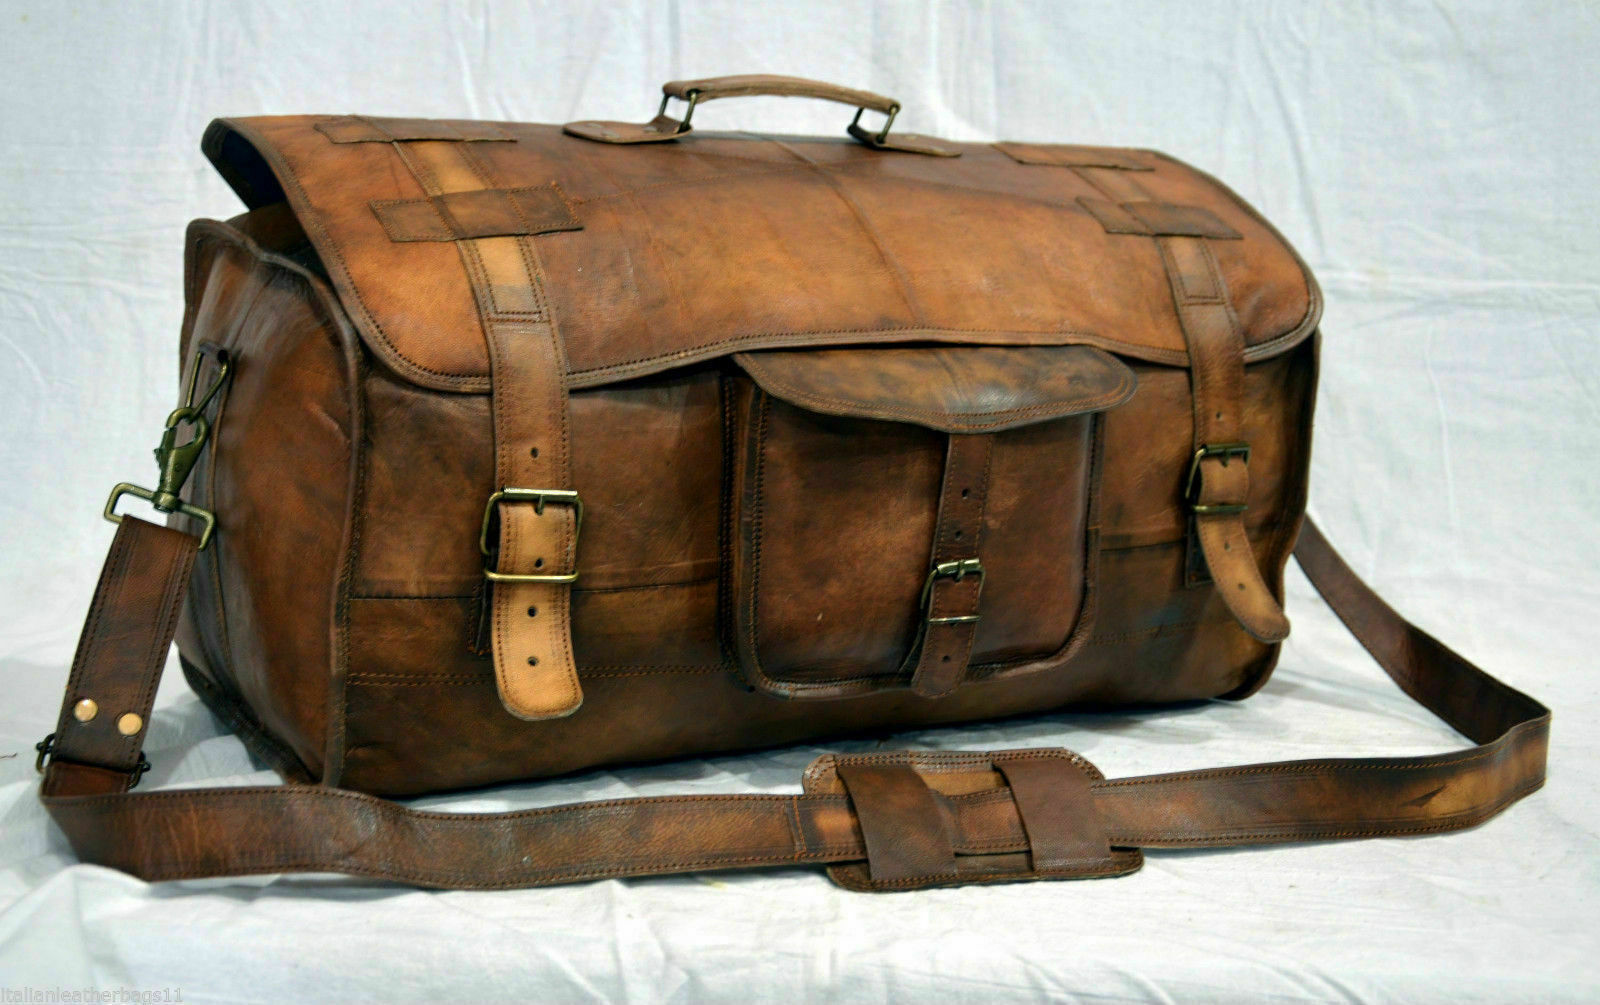 leather bag men Brown handmade travel luggage vintage overnight weekend duffel